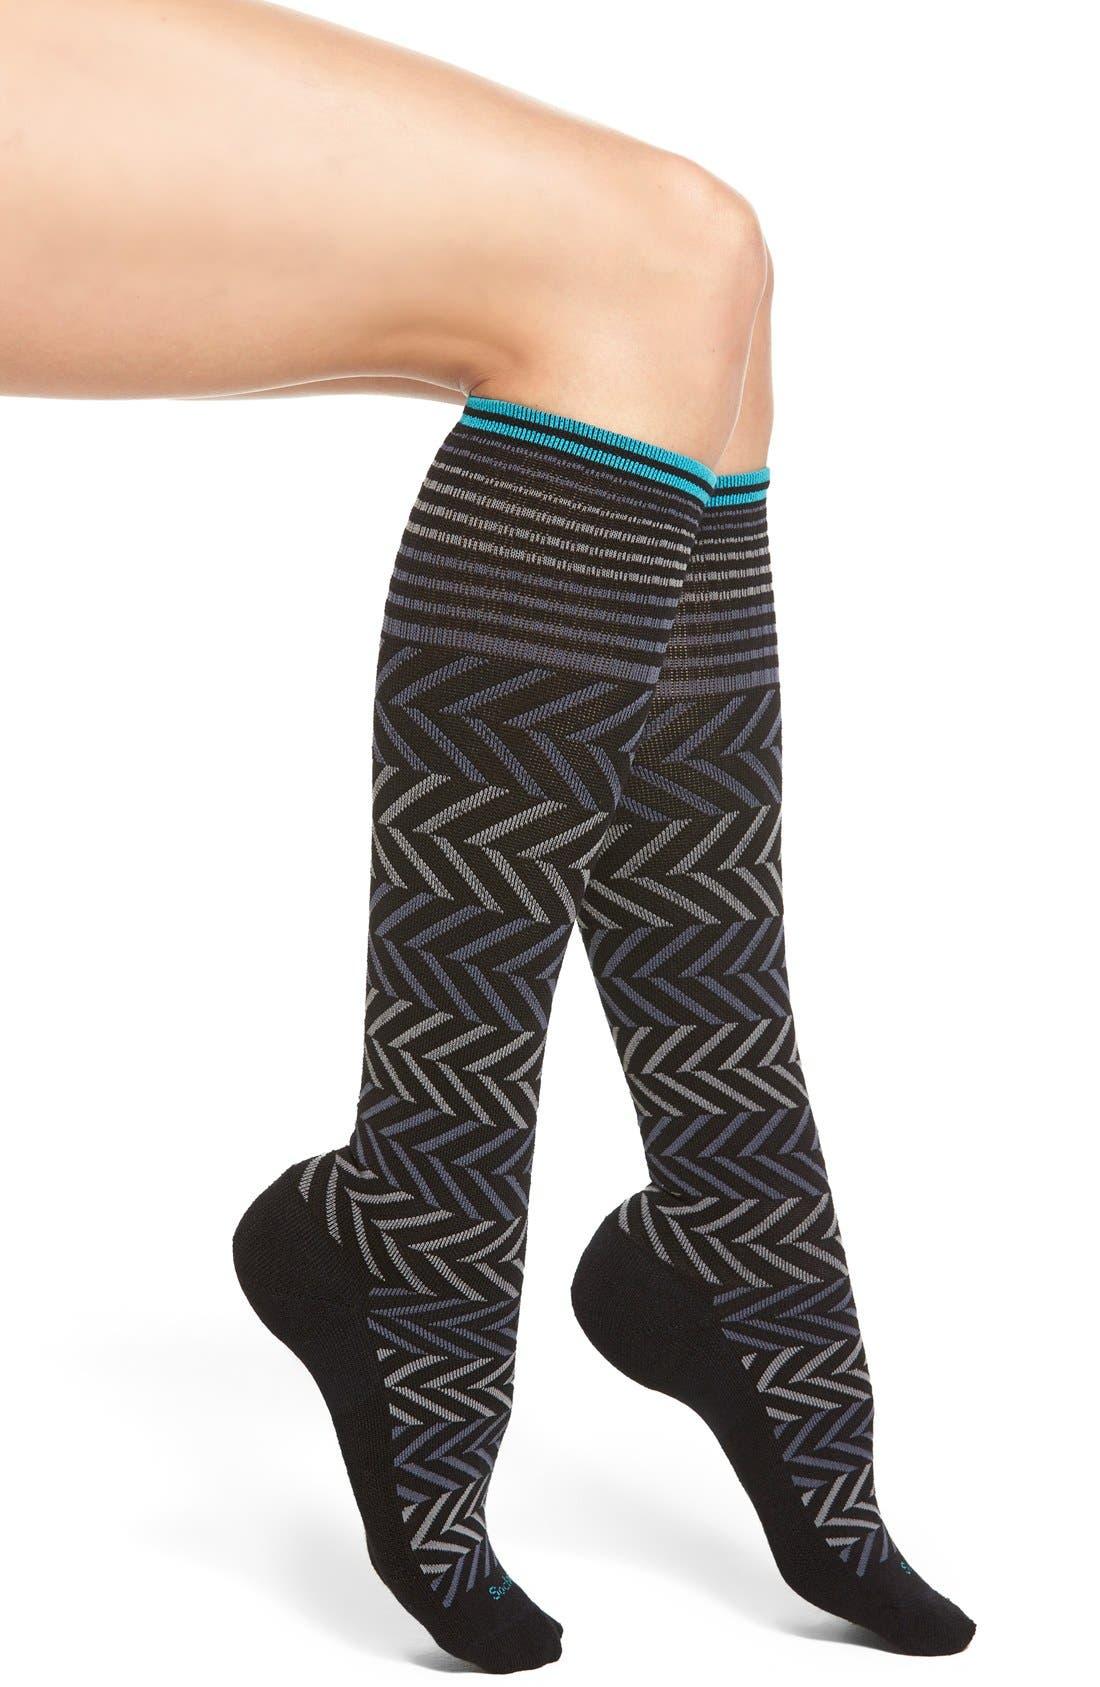 Sockwell Graduated Compression Socks